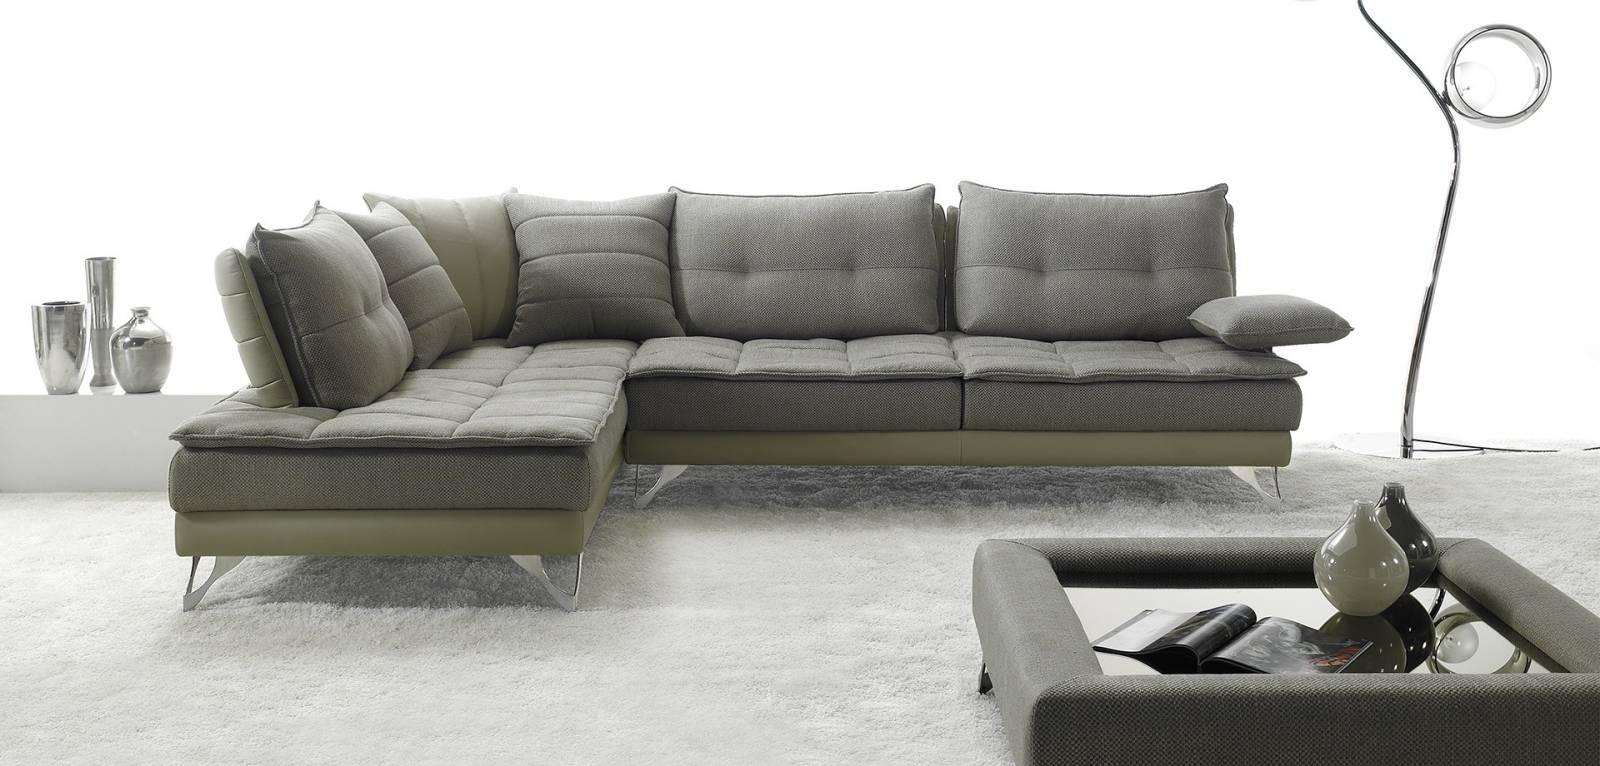 Salon avec dossiers avance recul meubles steinmetz for Salon marocain avec dossier